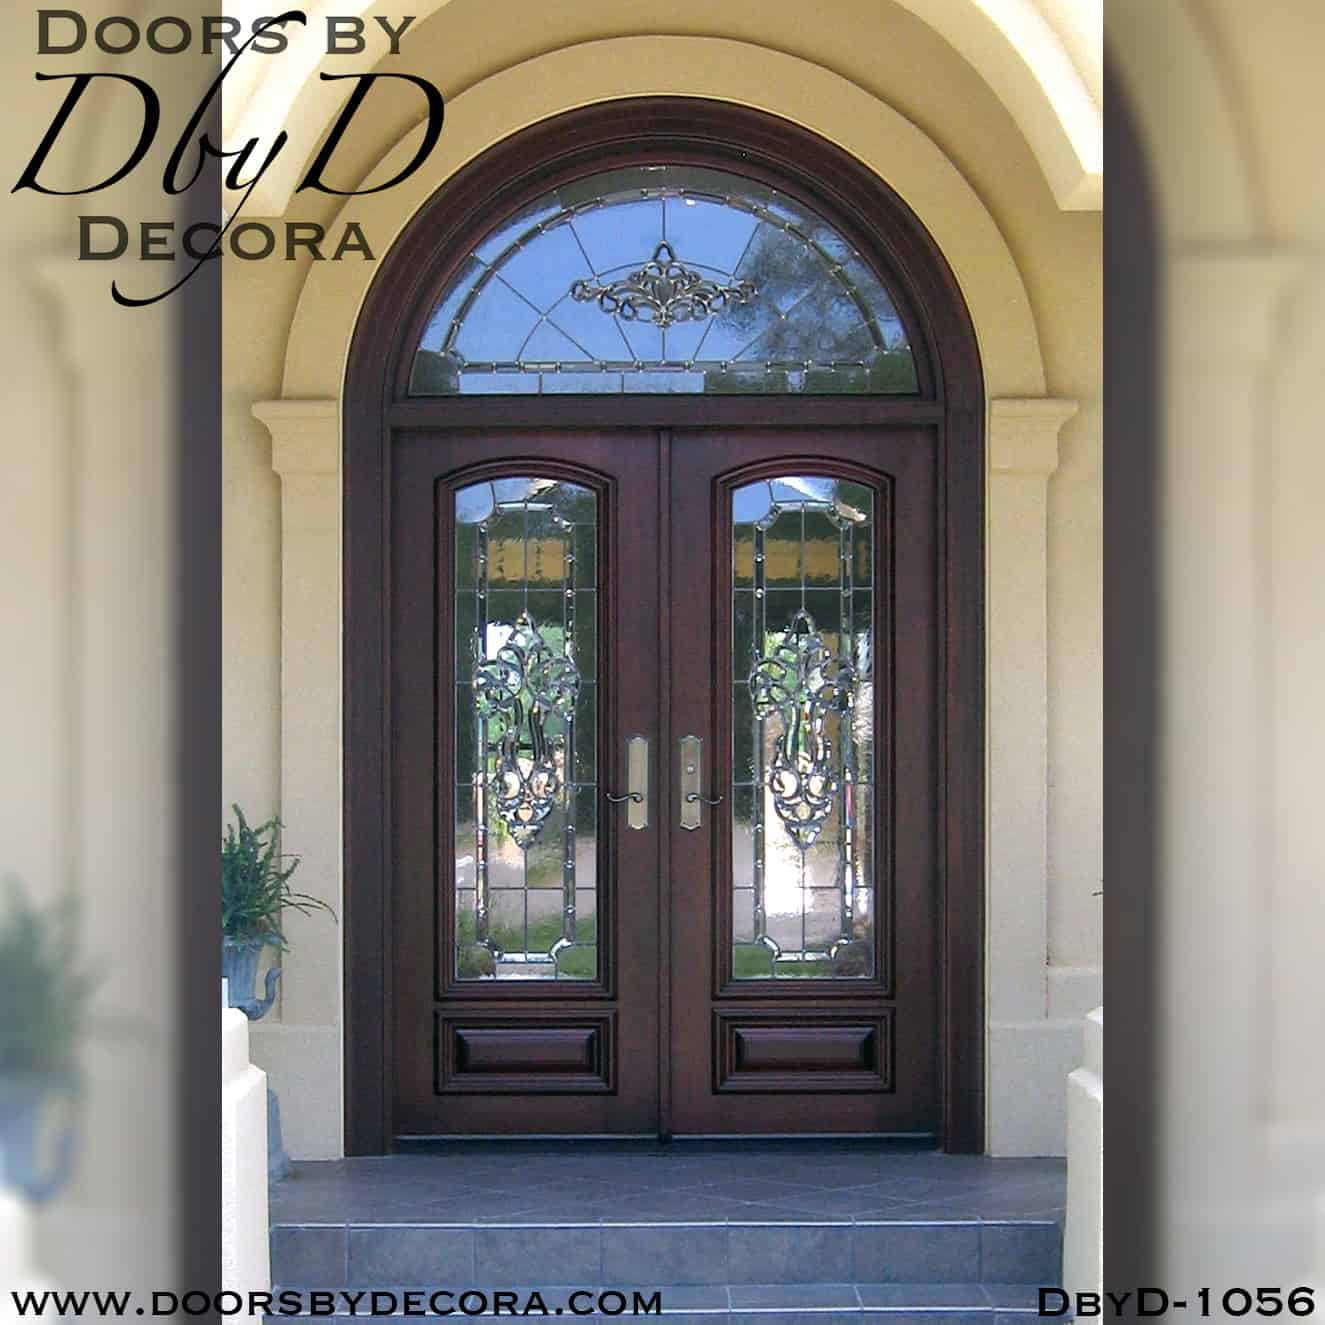 Custom Leaded Glass Double Door Entry Solid Wood Doors By Decora